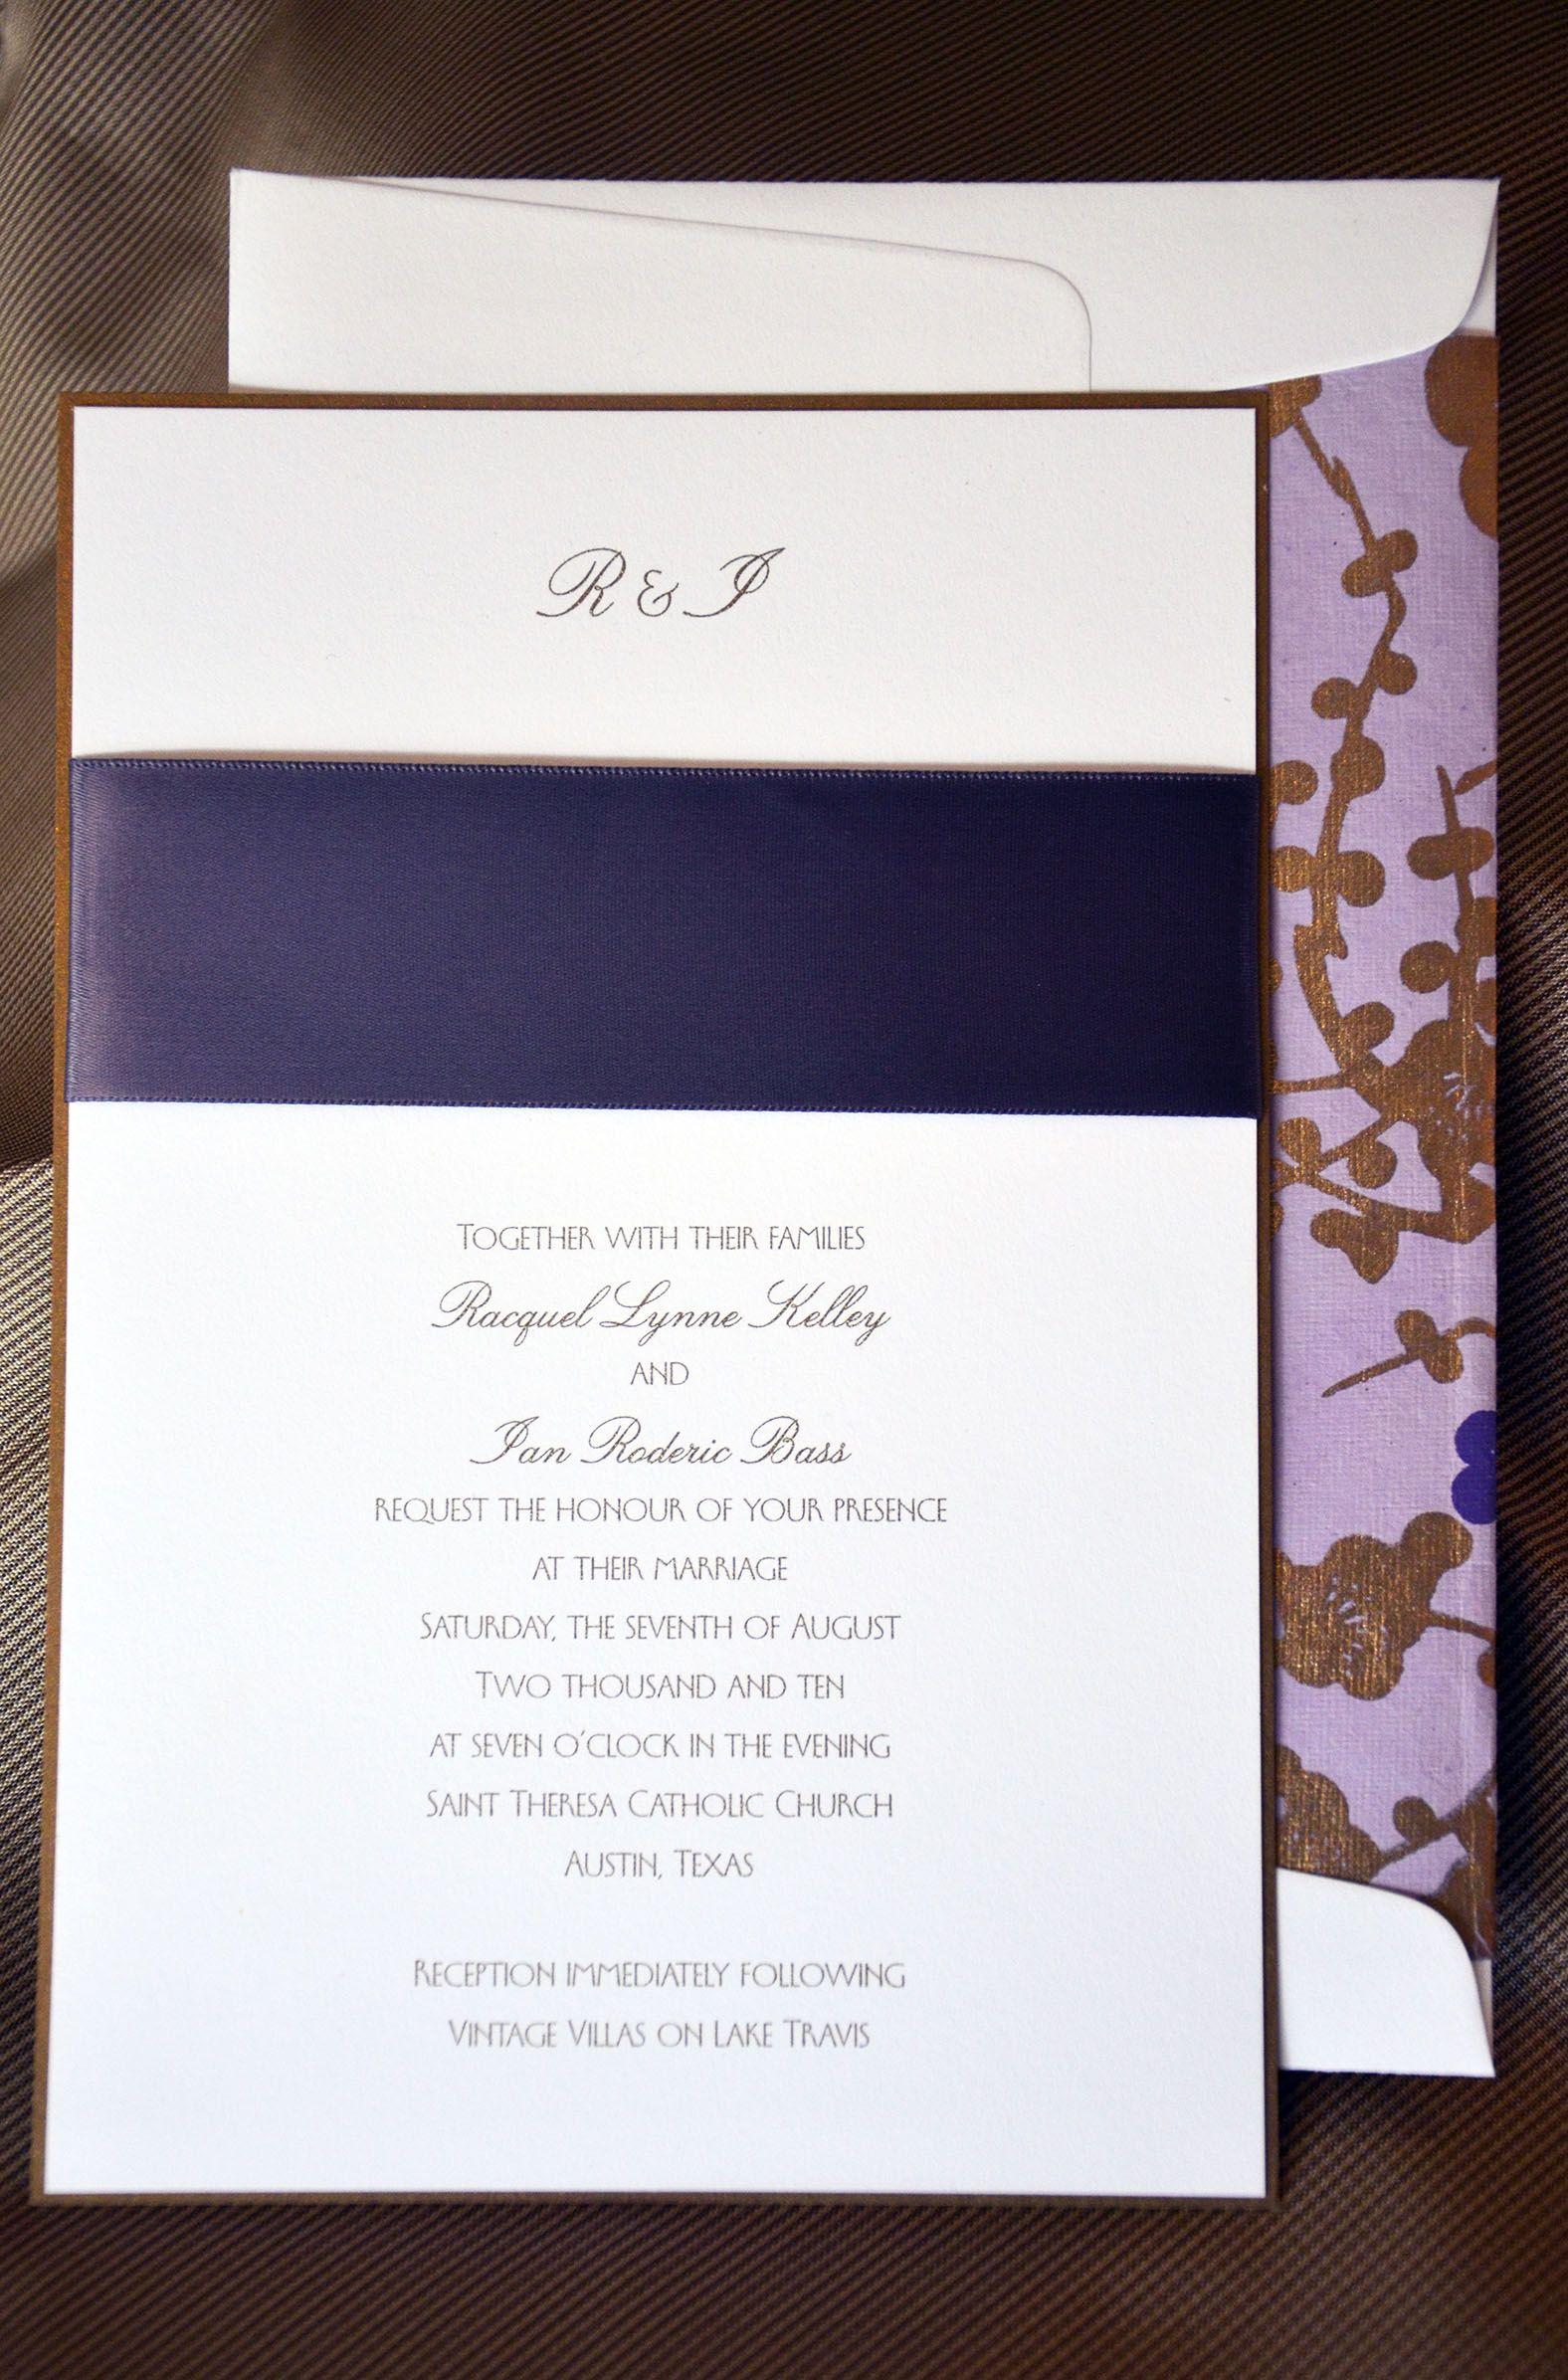 this very contemporary wedding invitation to st theresa catholic church in austin texas was - Wedding Invitations Austin Tx